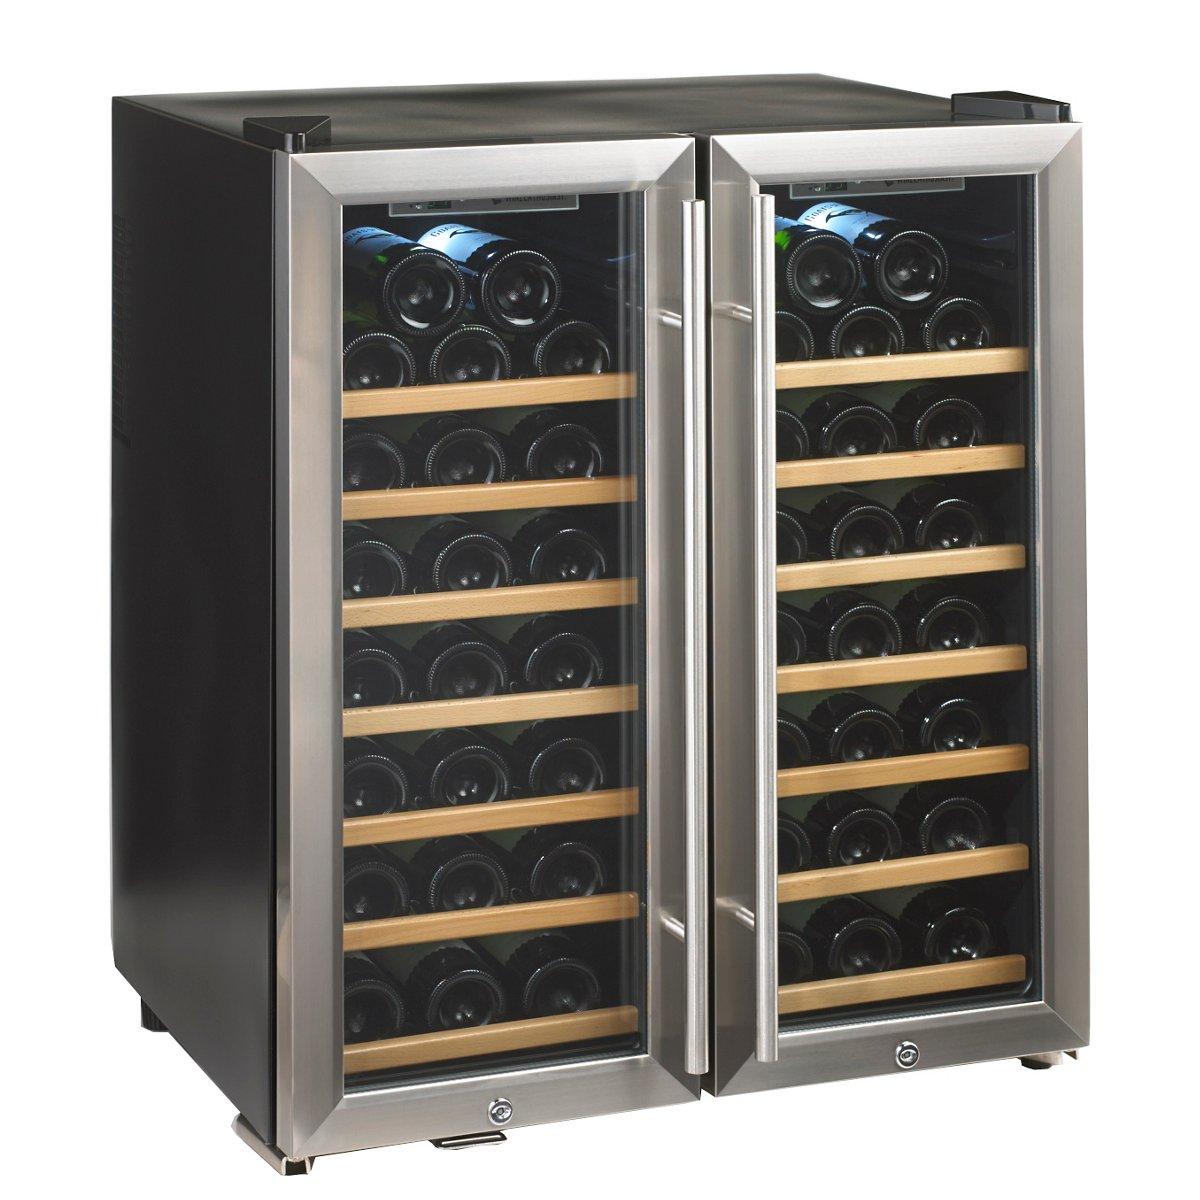 Silent 48 Bottle Dual Zone Wine Refrigerator Stainless Steel Trim Door